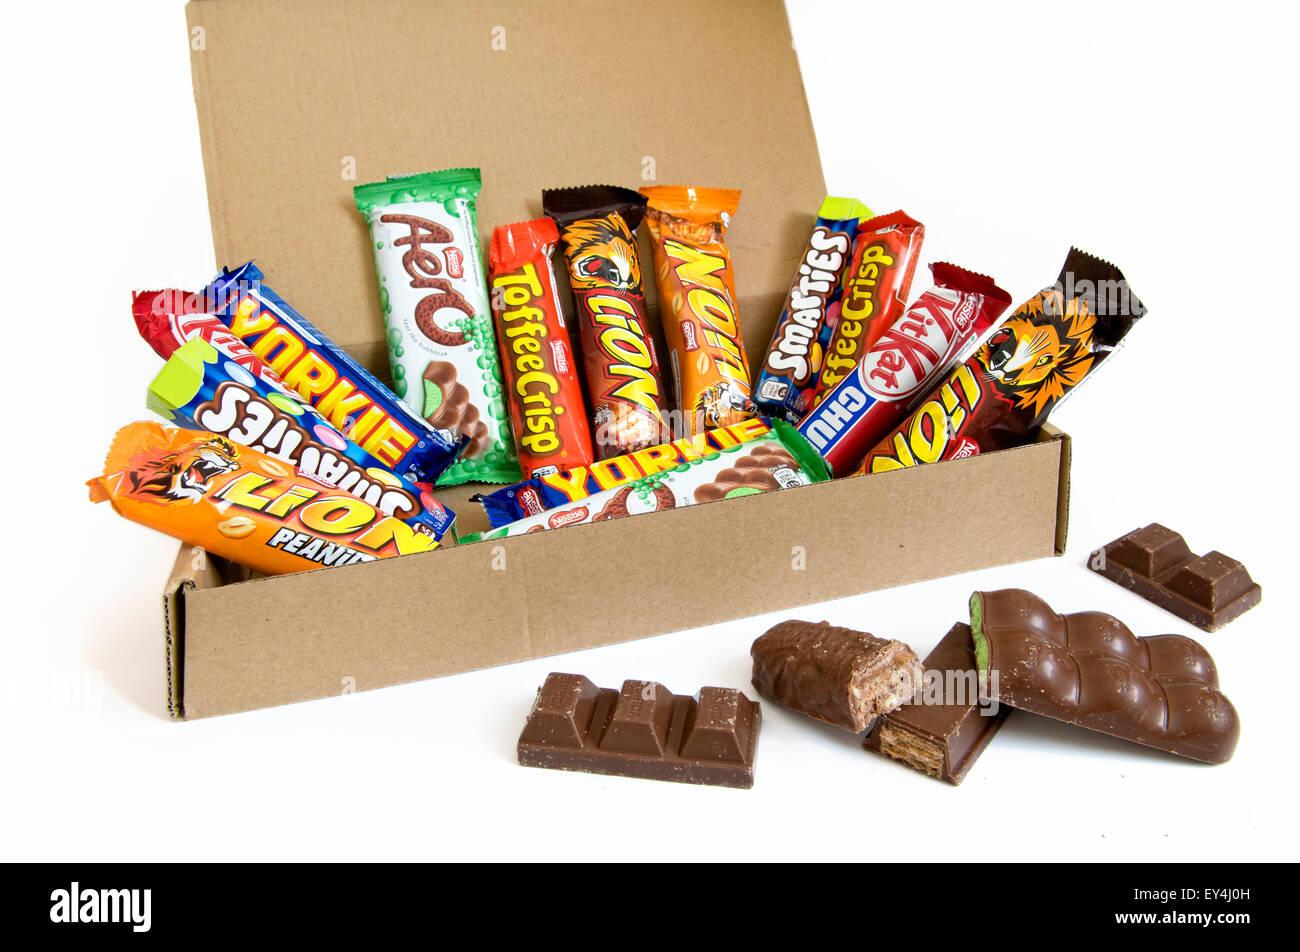 A box of Nestle chocolate bar selection - Stock Image